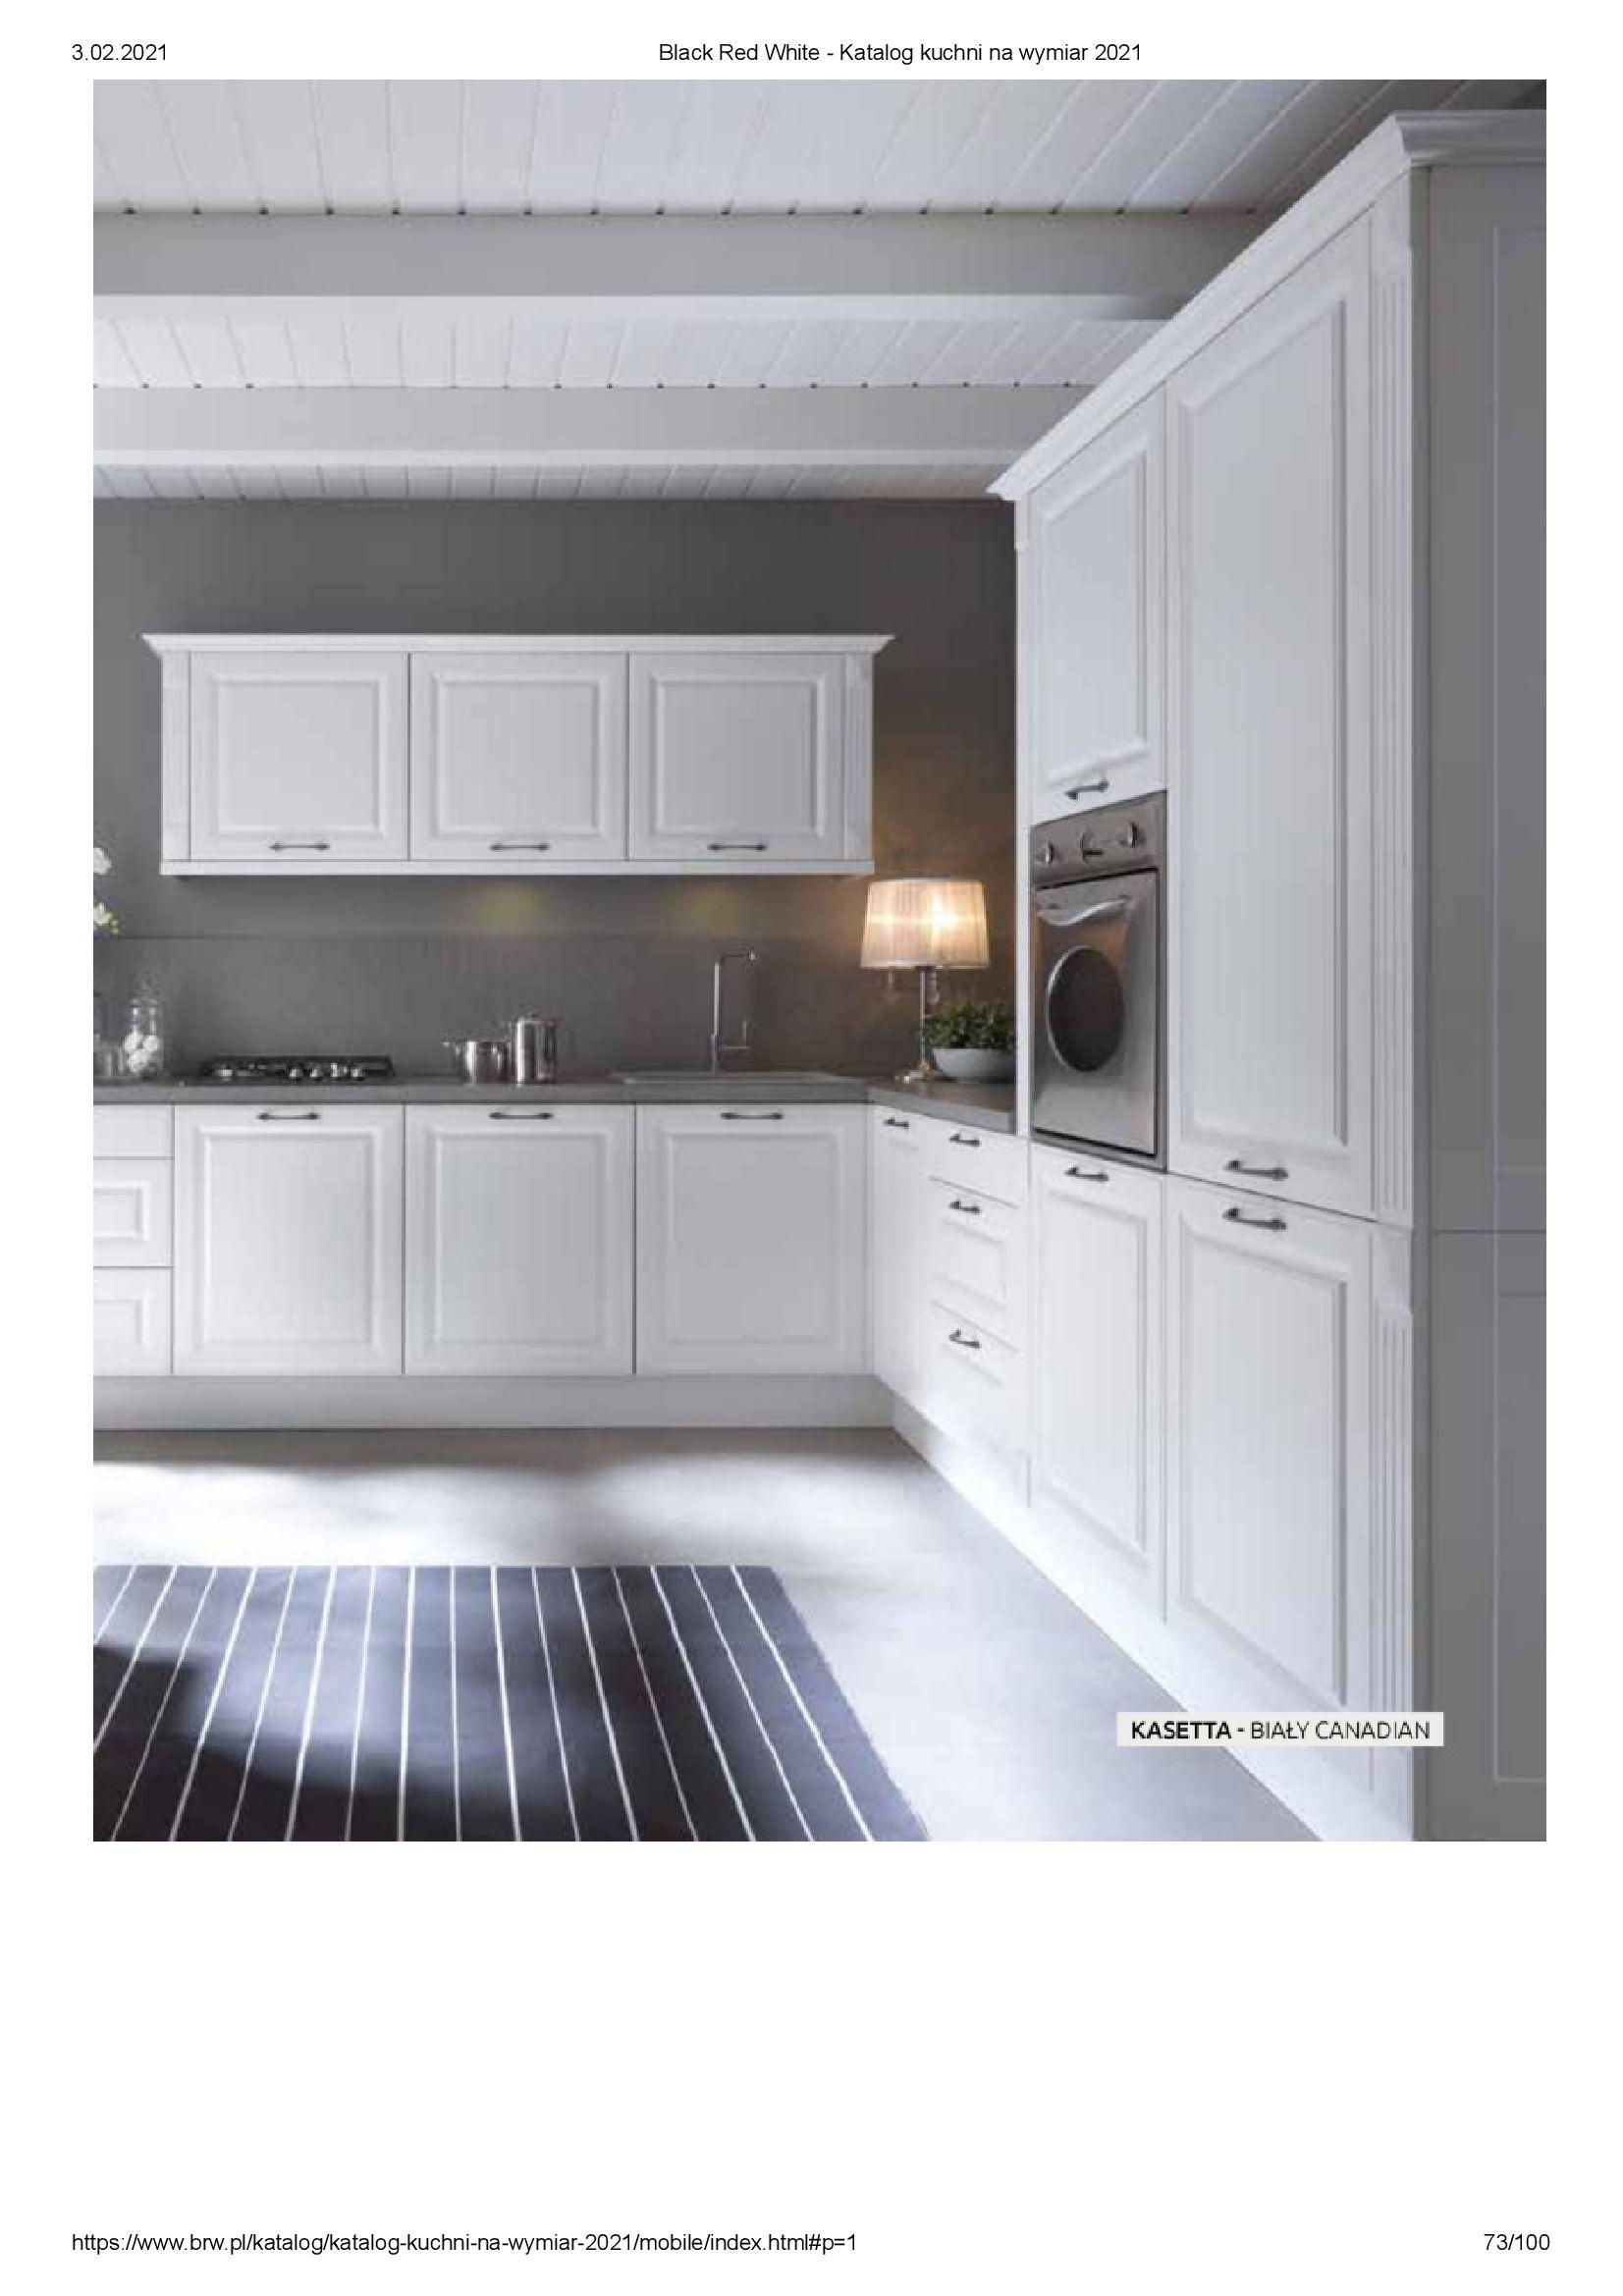 Gazetka Black Red White: Katalog - Kuchnie na wymiar Senso Kitchens 2021 2021-01-01 page-73